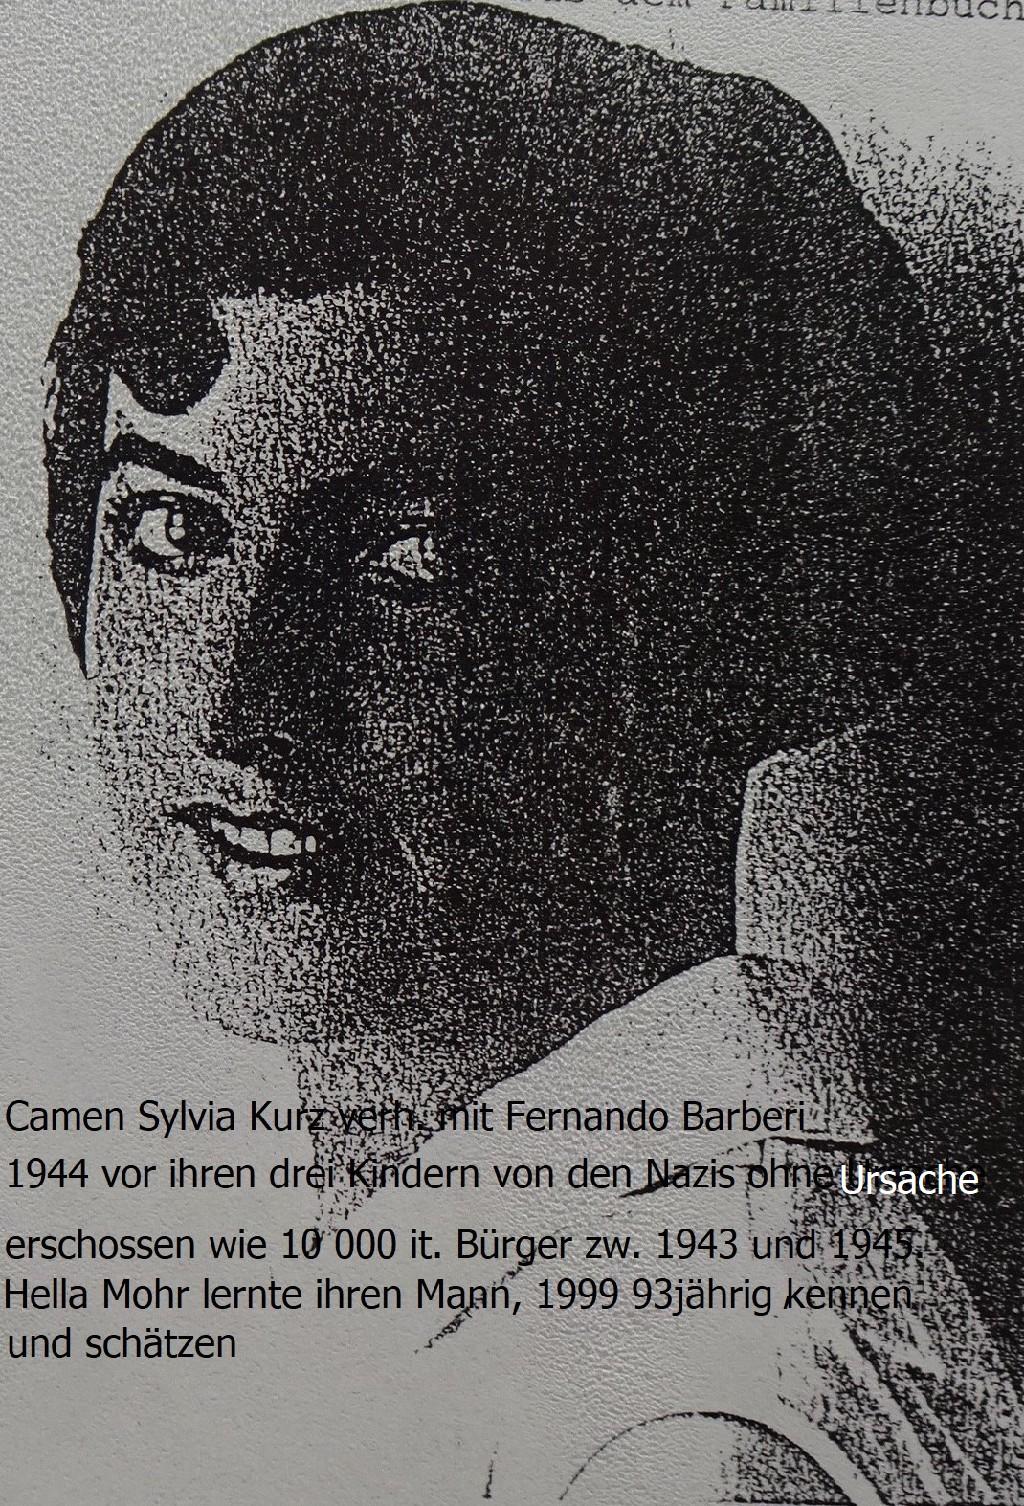 Carmen Sylvia Kurz